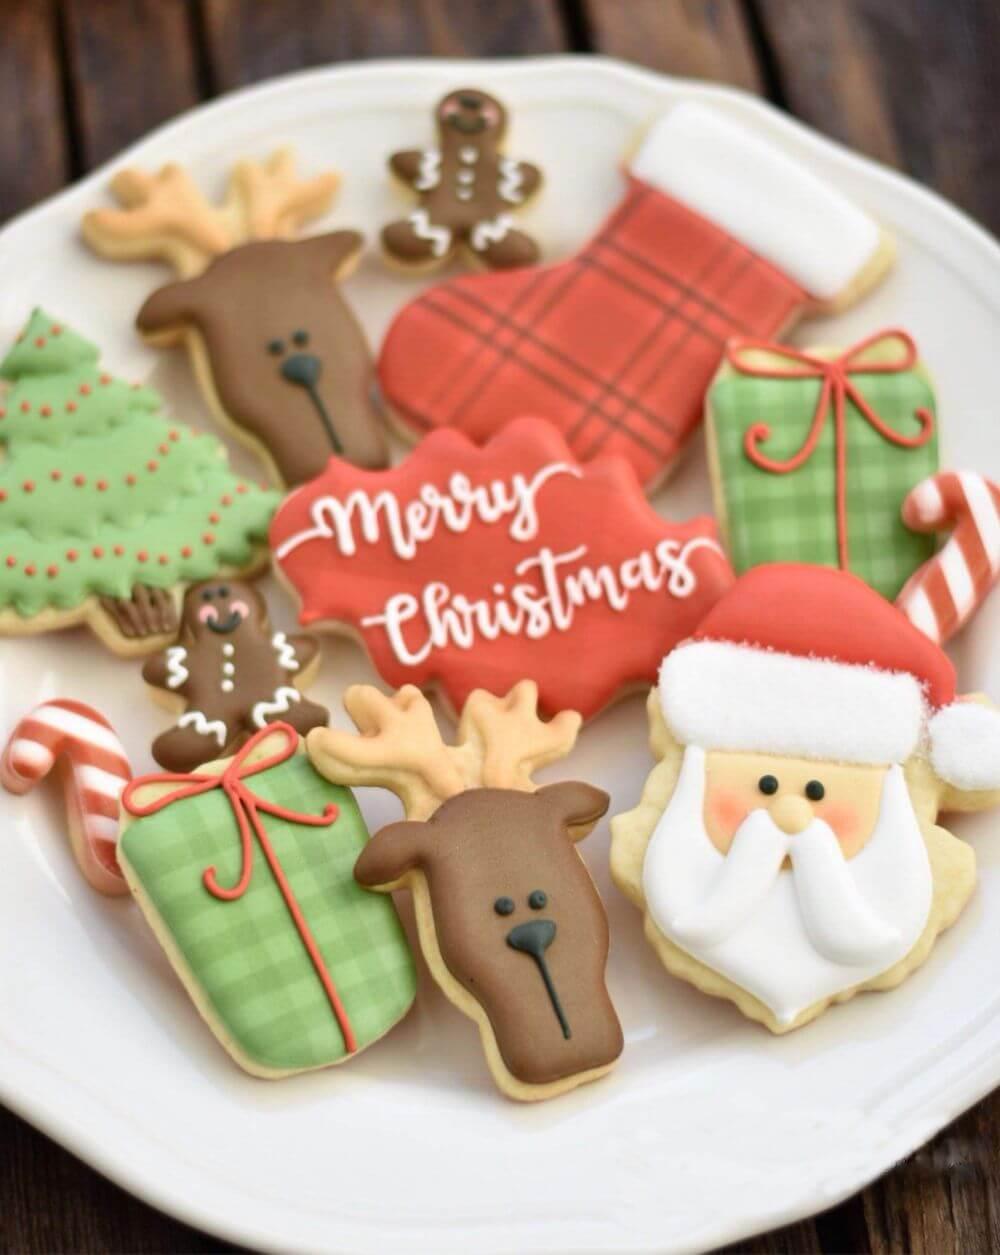 Name-Merry Christmas_Tag-Celebrations Vignettes_Season-Winter Christmas